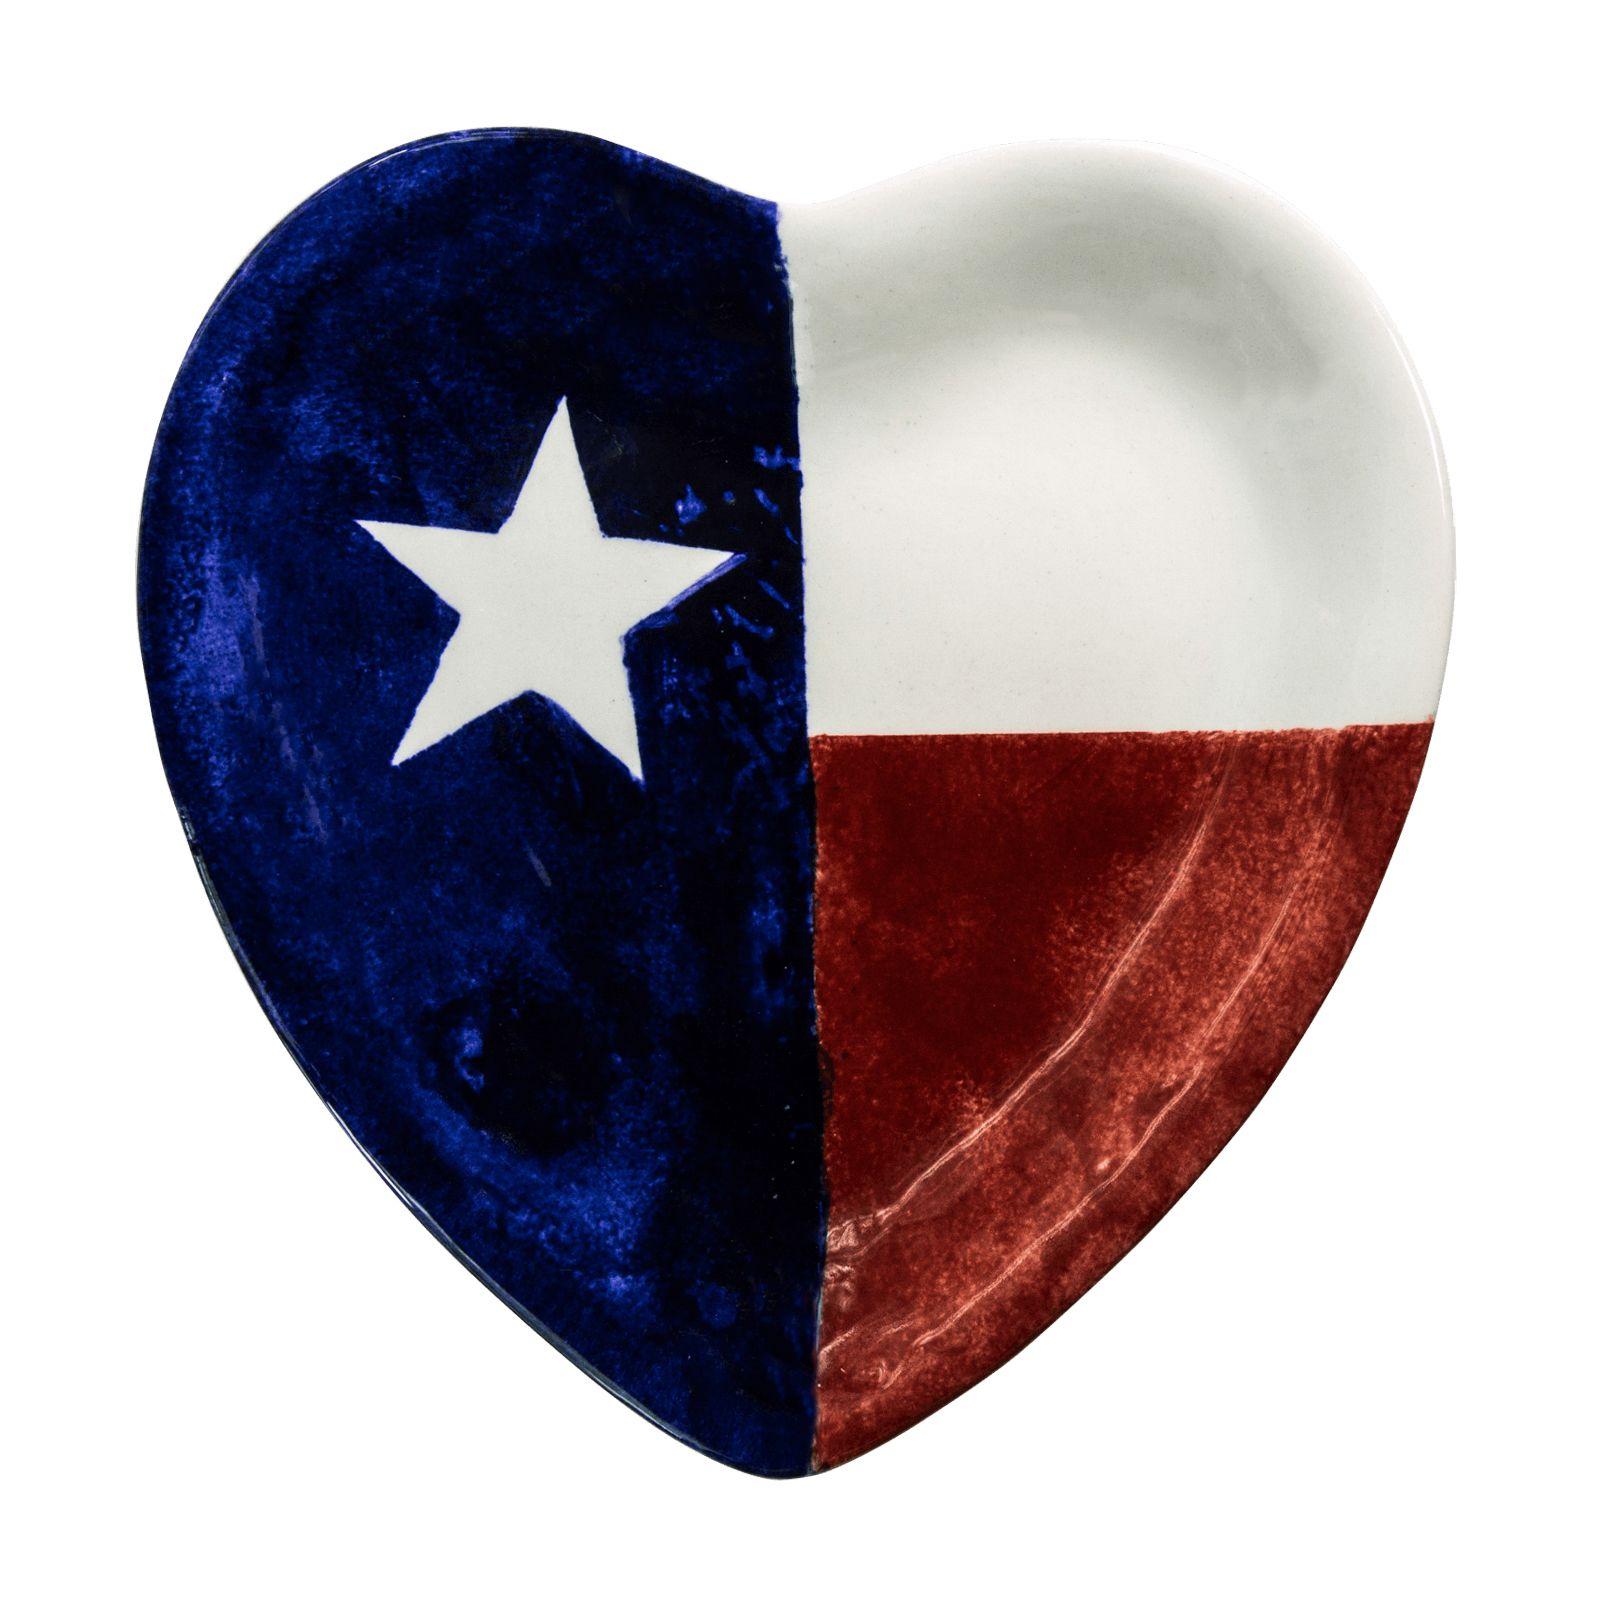 1600x1600 Texas Flag Heart Platter Texas Capitol Gift Shop